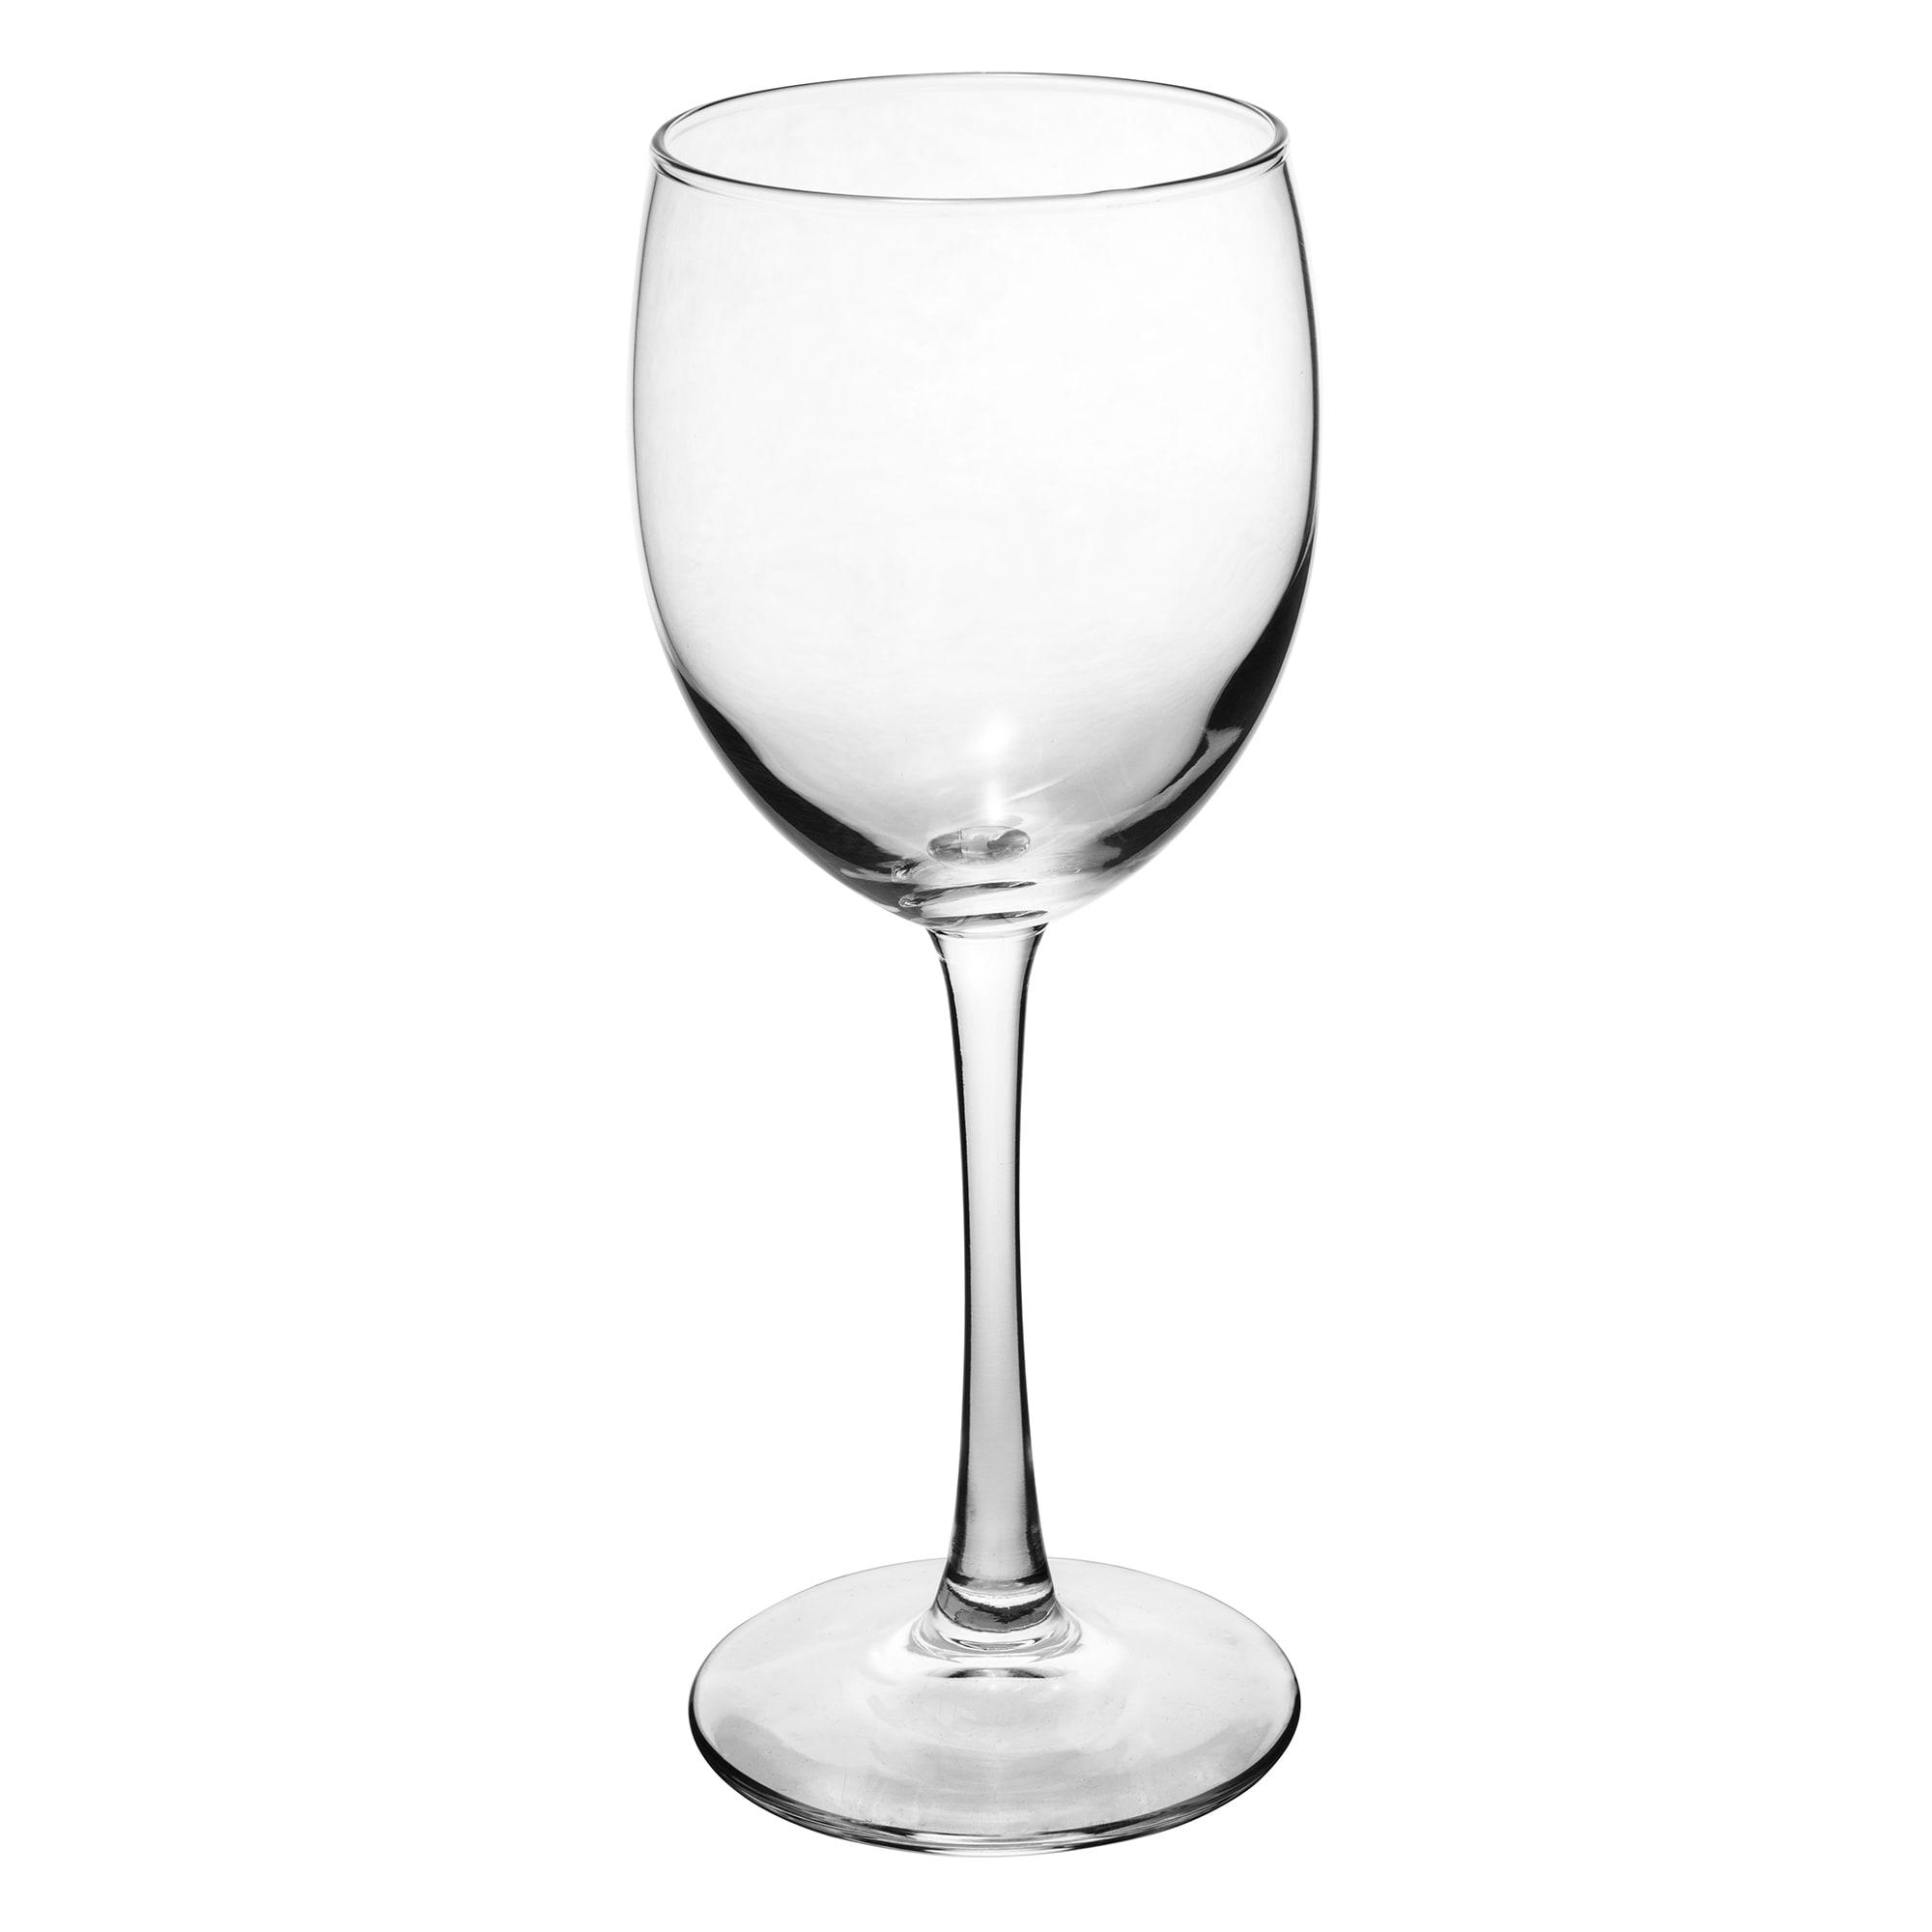 Libbey 7502 12-oz Vina White Wine Glass - Safedge Rim & Foot Guarantee